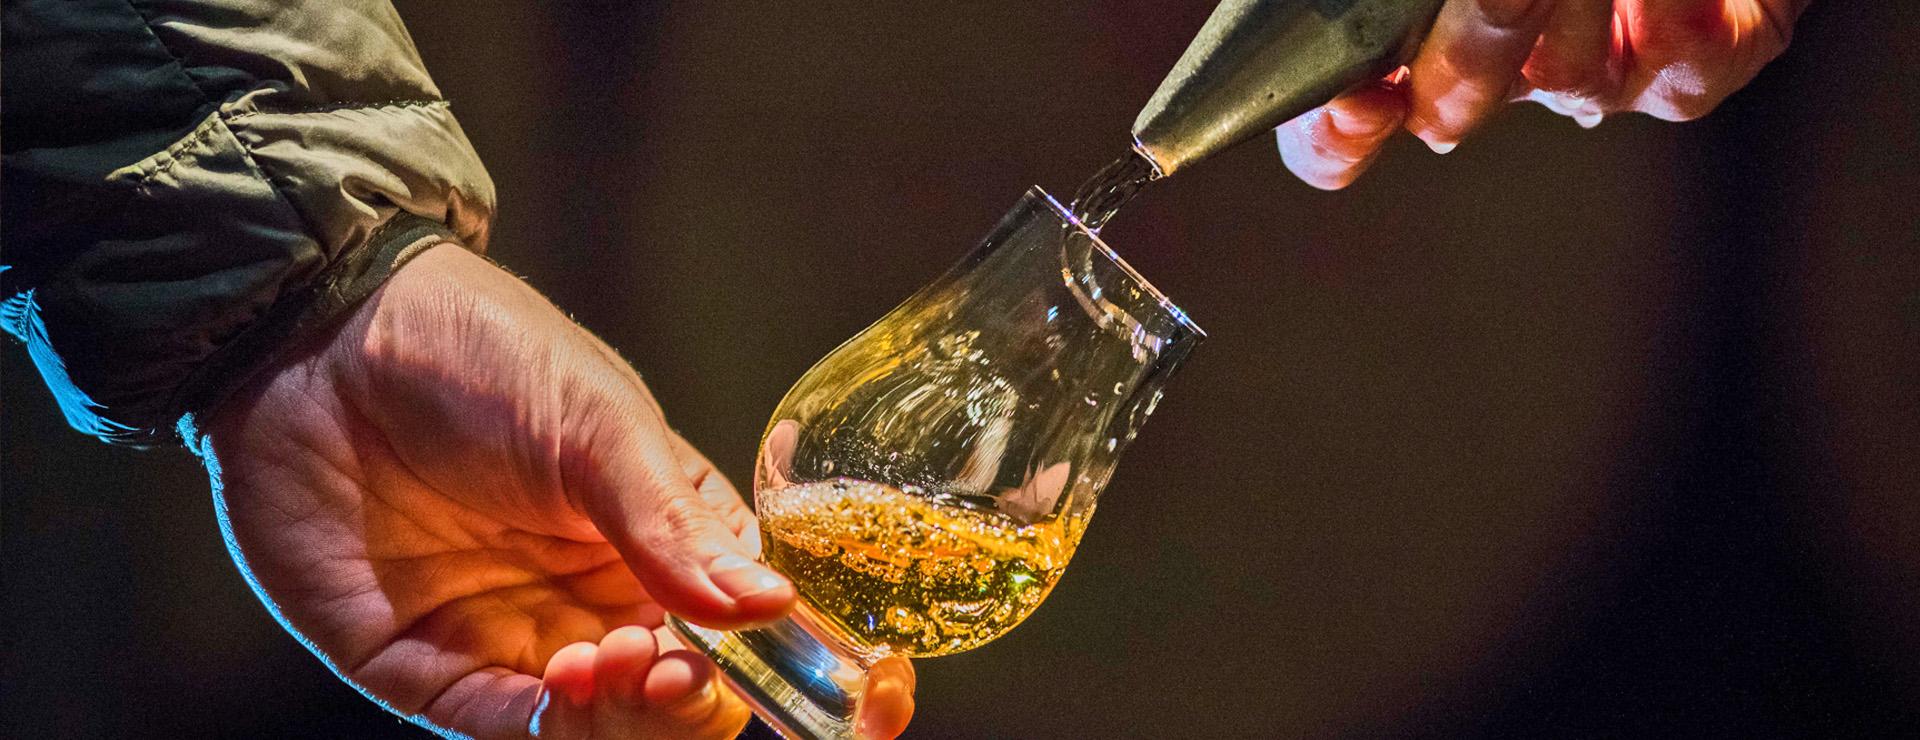 Cask Tasting Tour at Dewar's Aberfeldy Distillery - taste single cask whisky